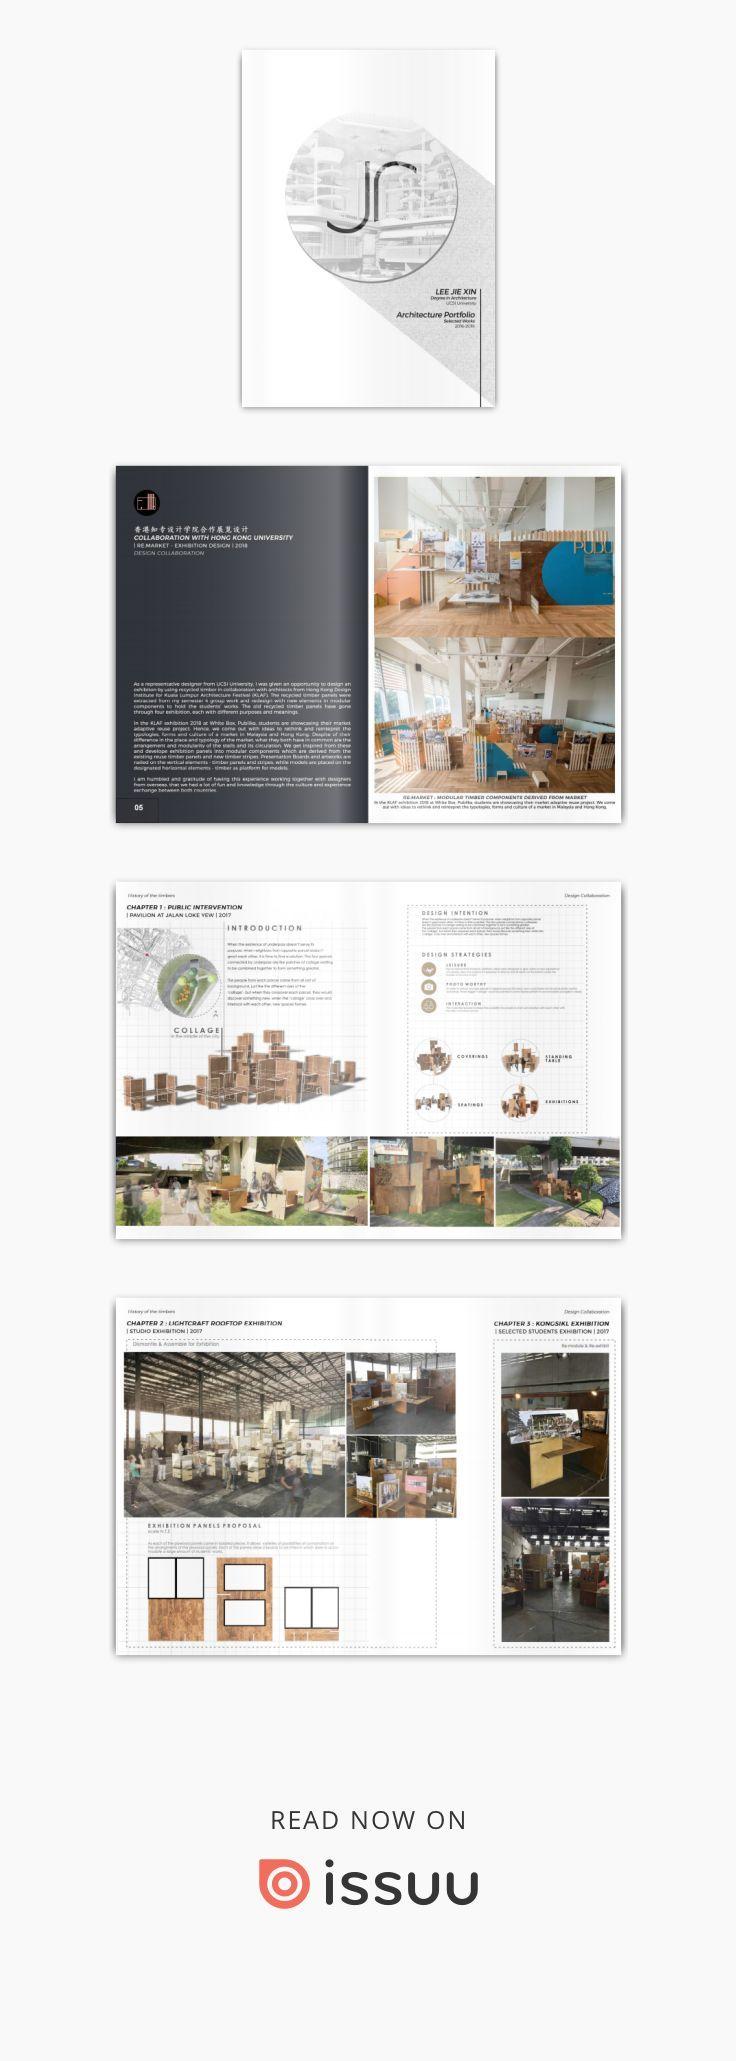 Architecture Portfolio 2016 2019 Lee Jie Xin Bsc Hons In Architecture Architecture Portfolio Architecture Portfolio Examples Portfolio Examples